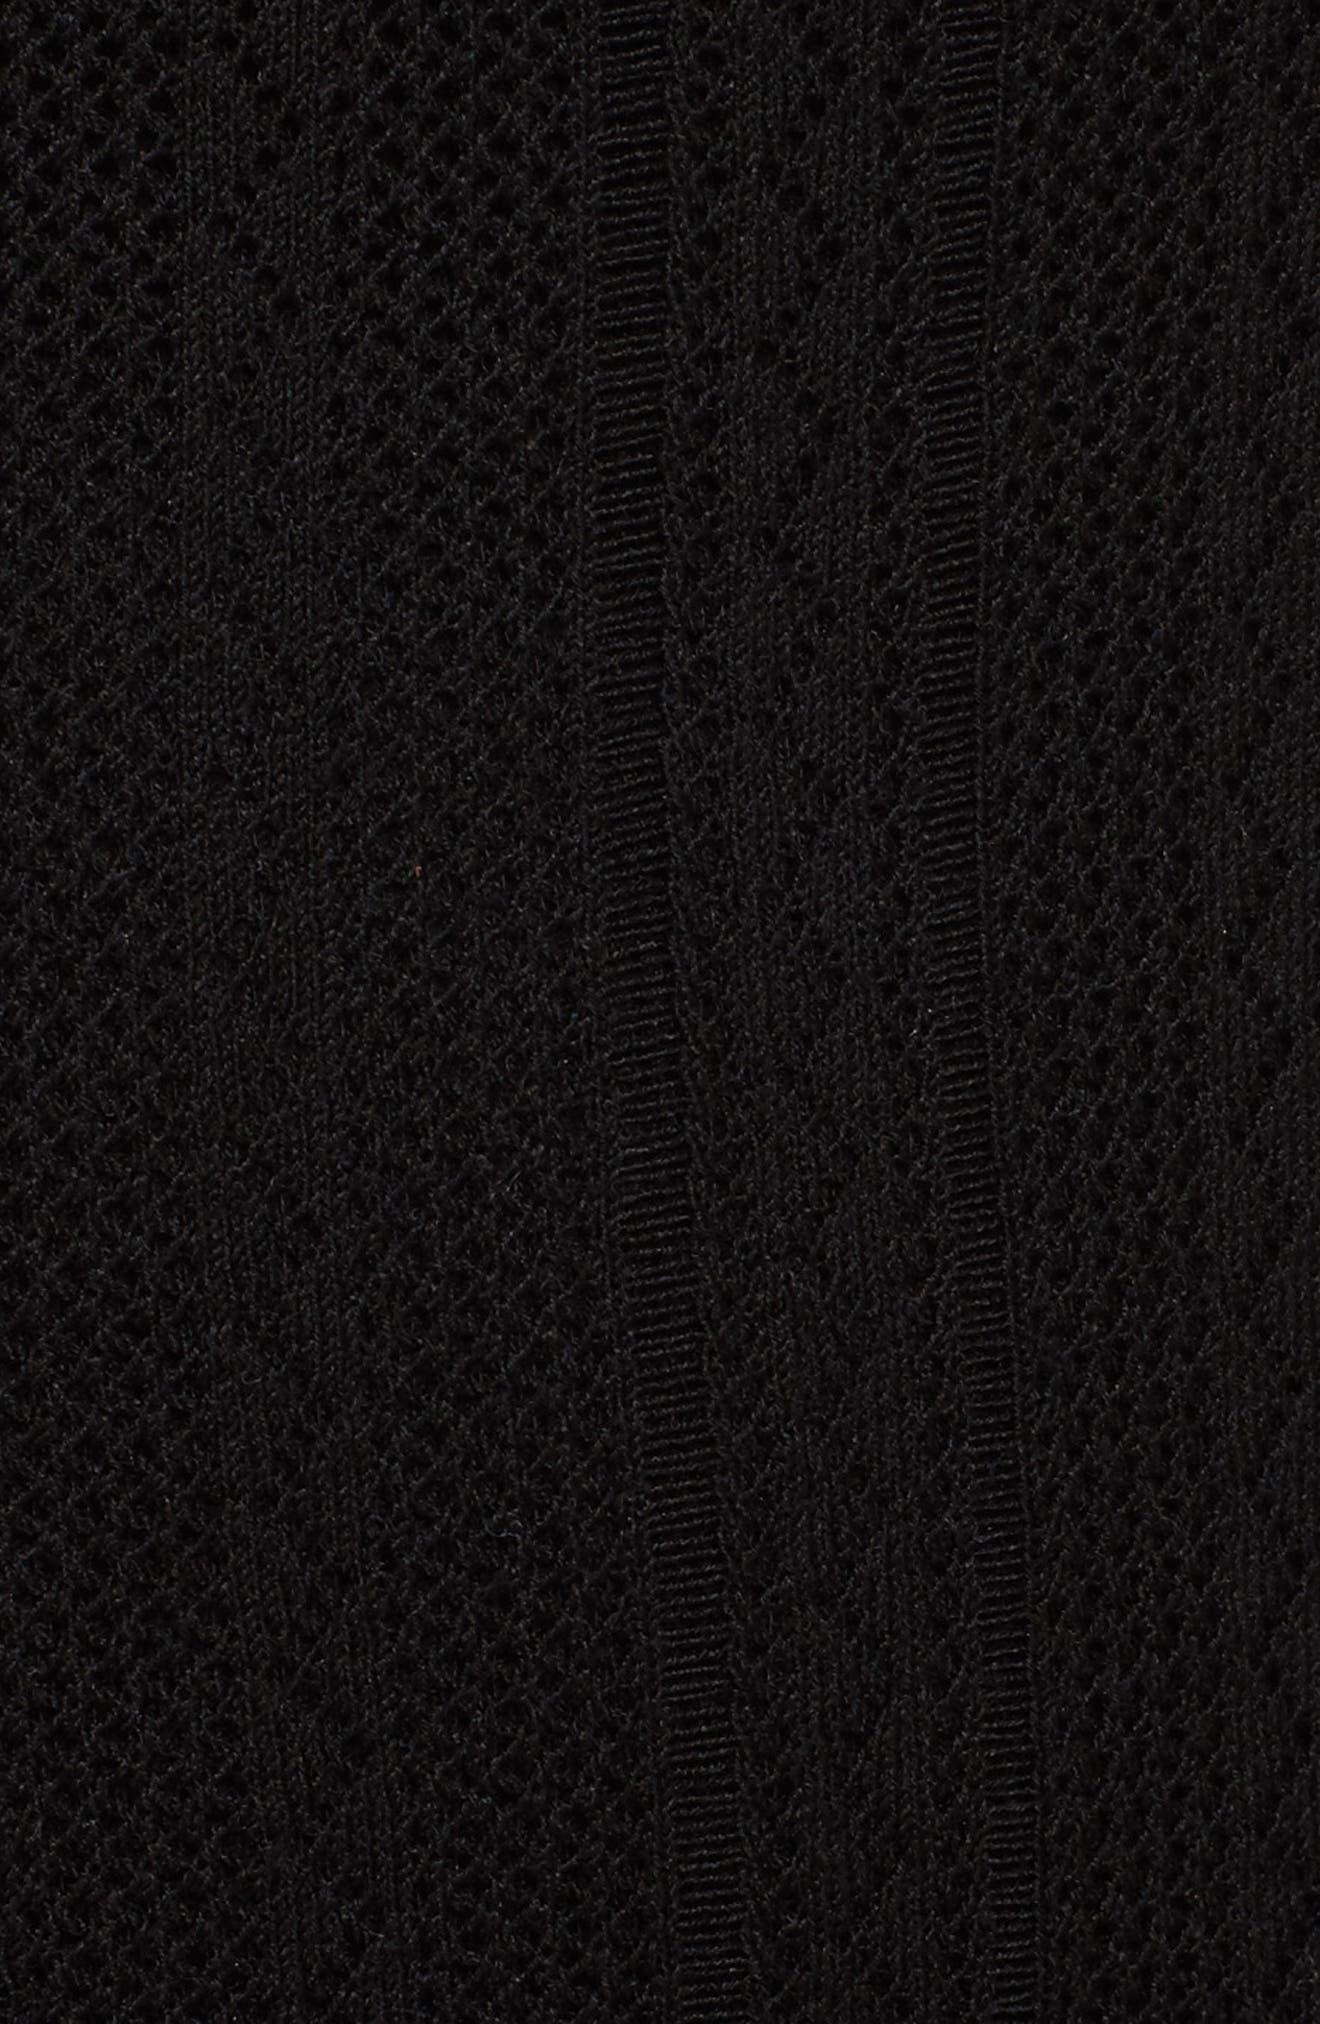 Prosecco Lace Knit Cardigan,                             Alternate thumbnail 5, color,                             Black